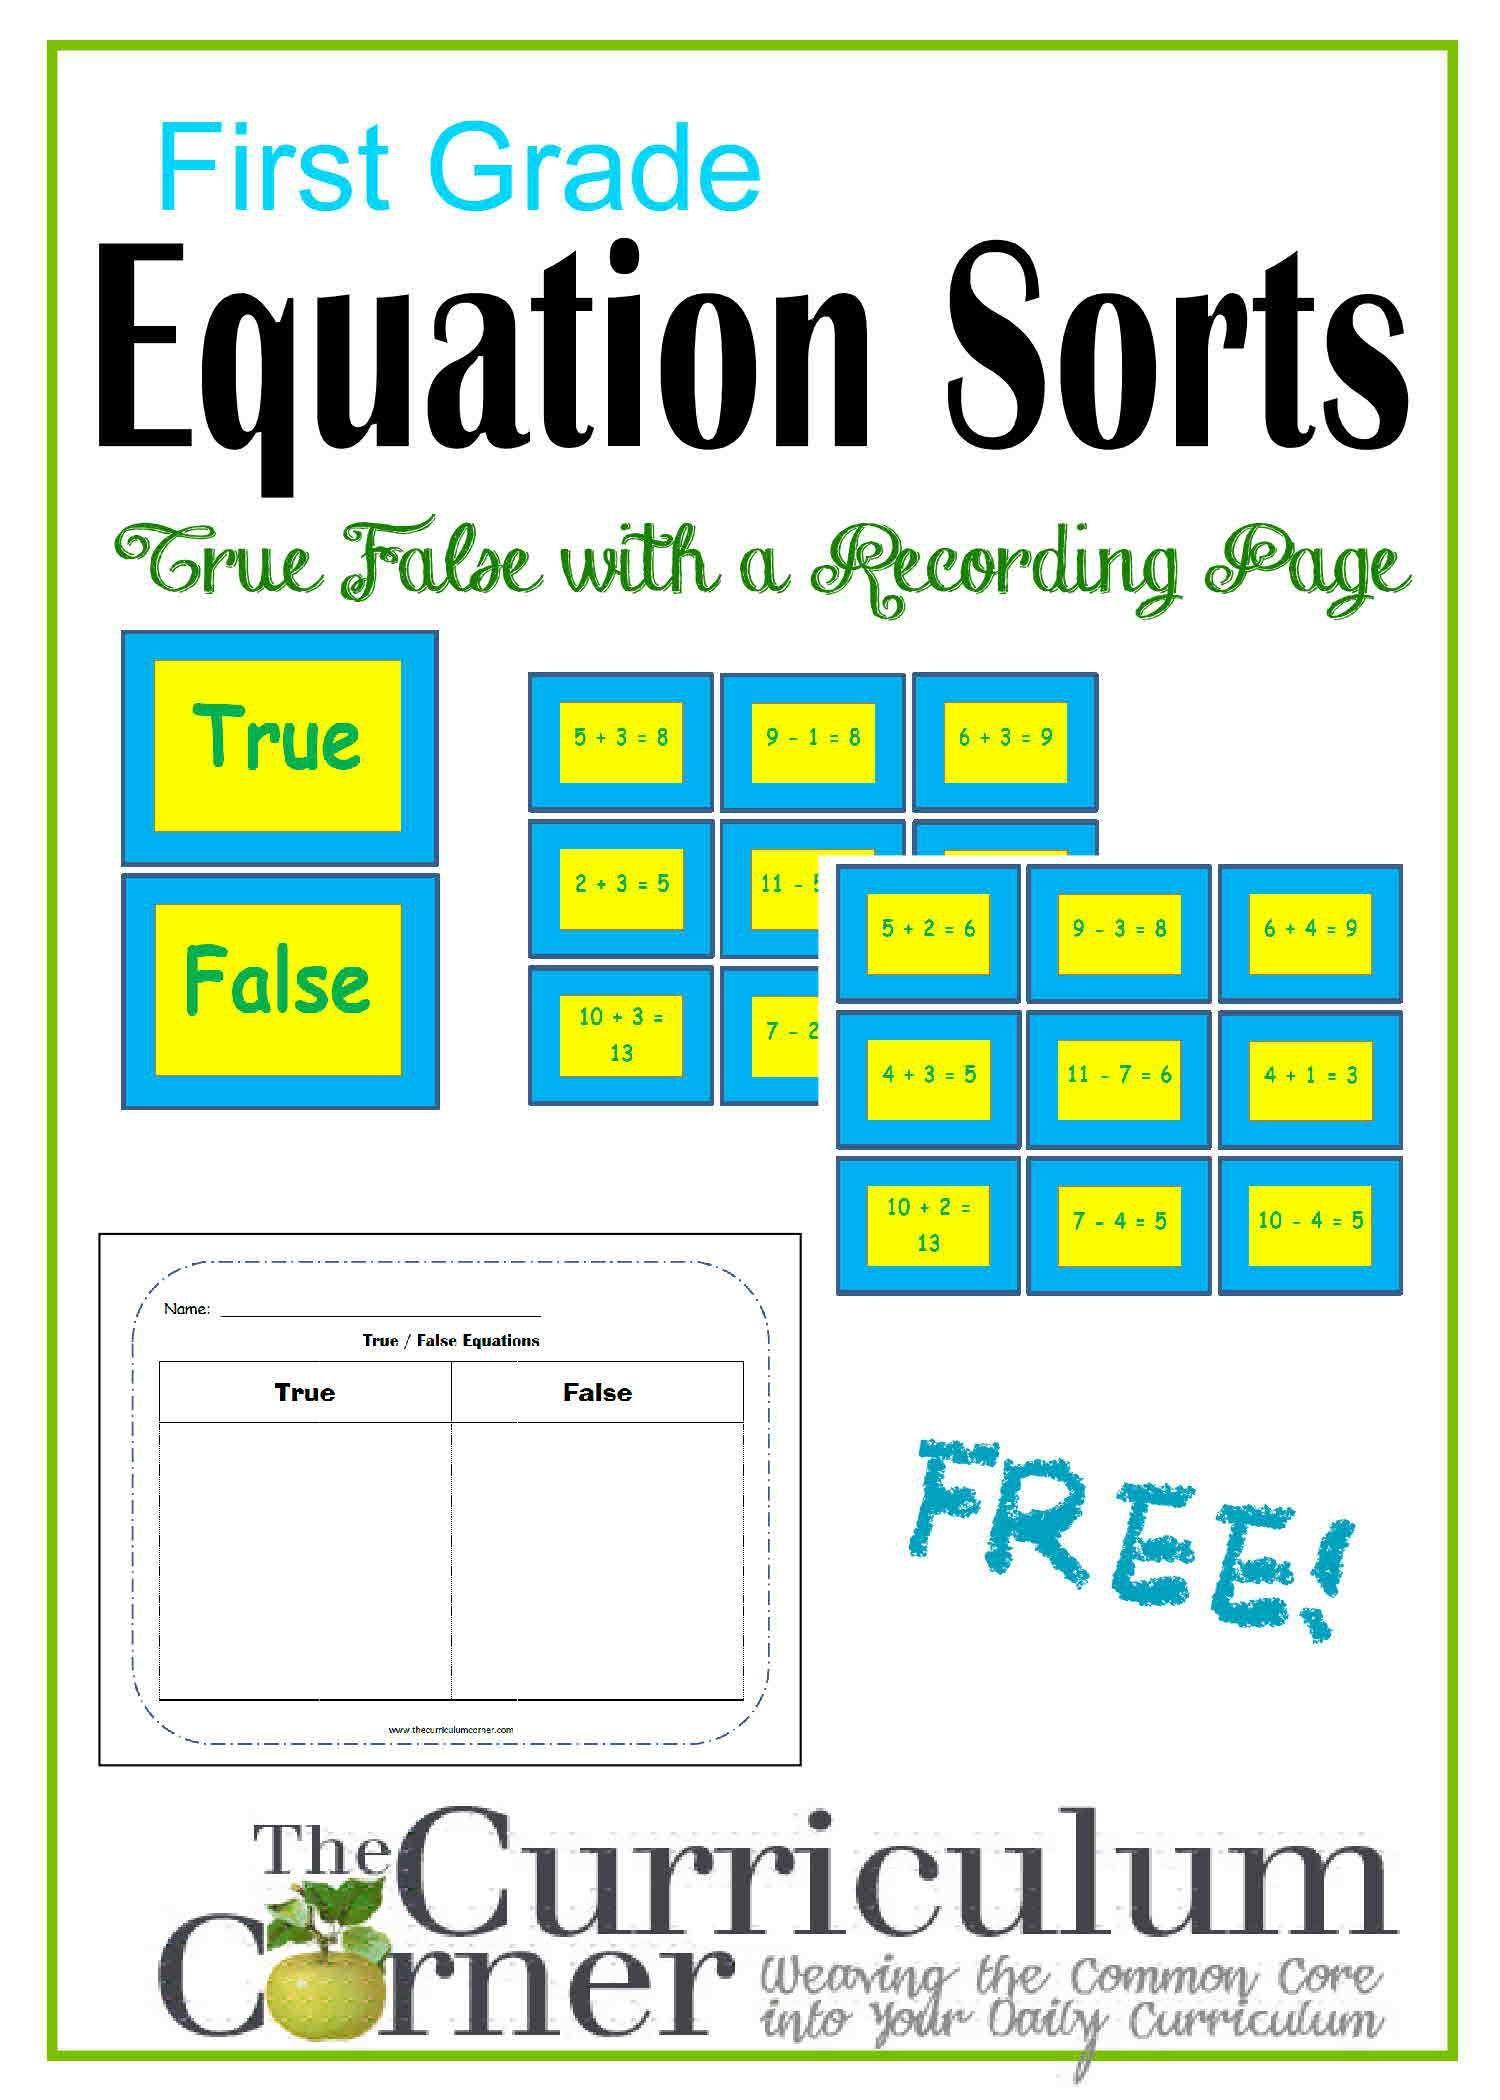 First Grade True/False Equation Sorts | Algebra | Pinterest ...